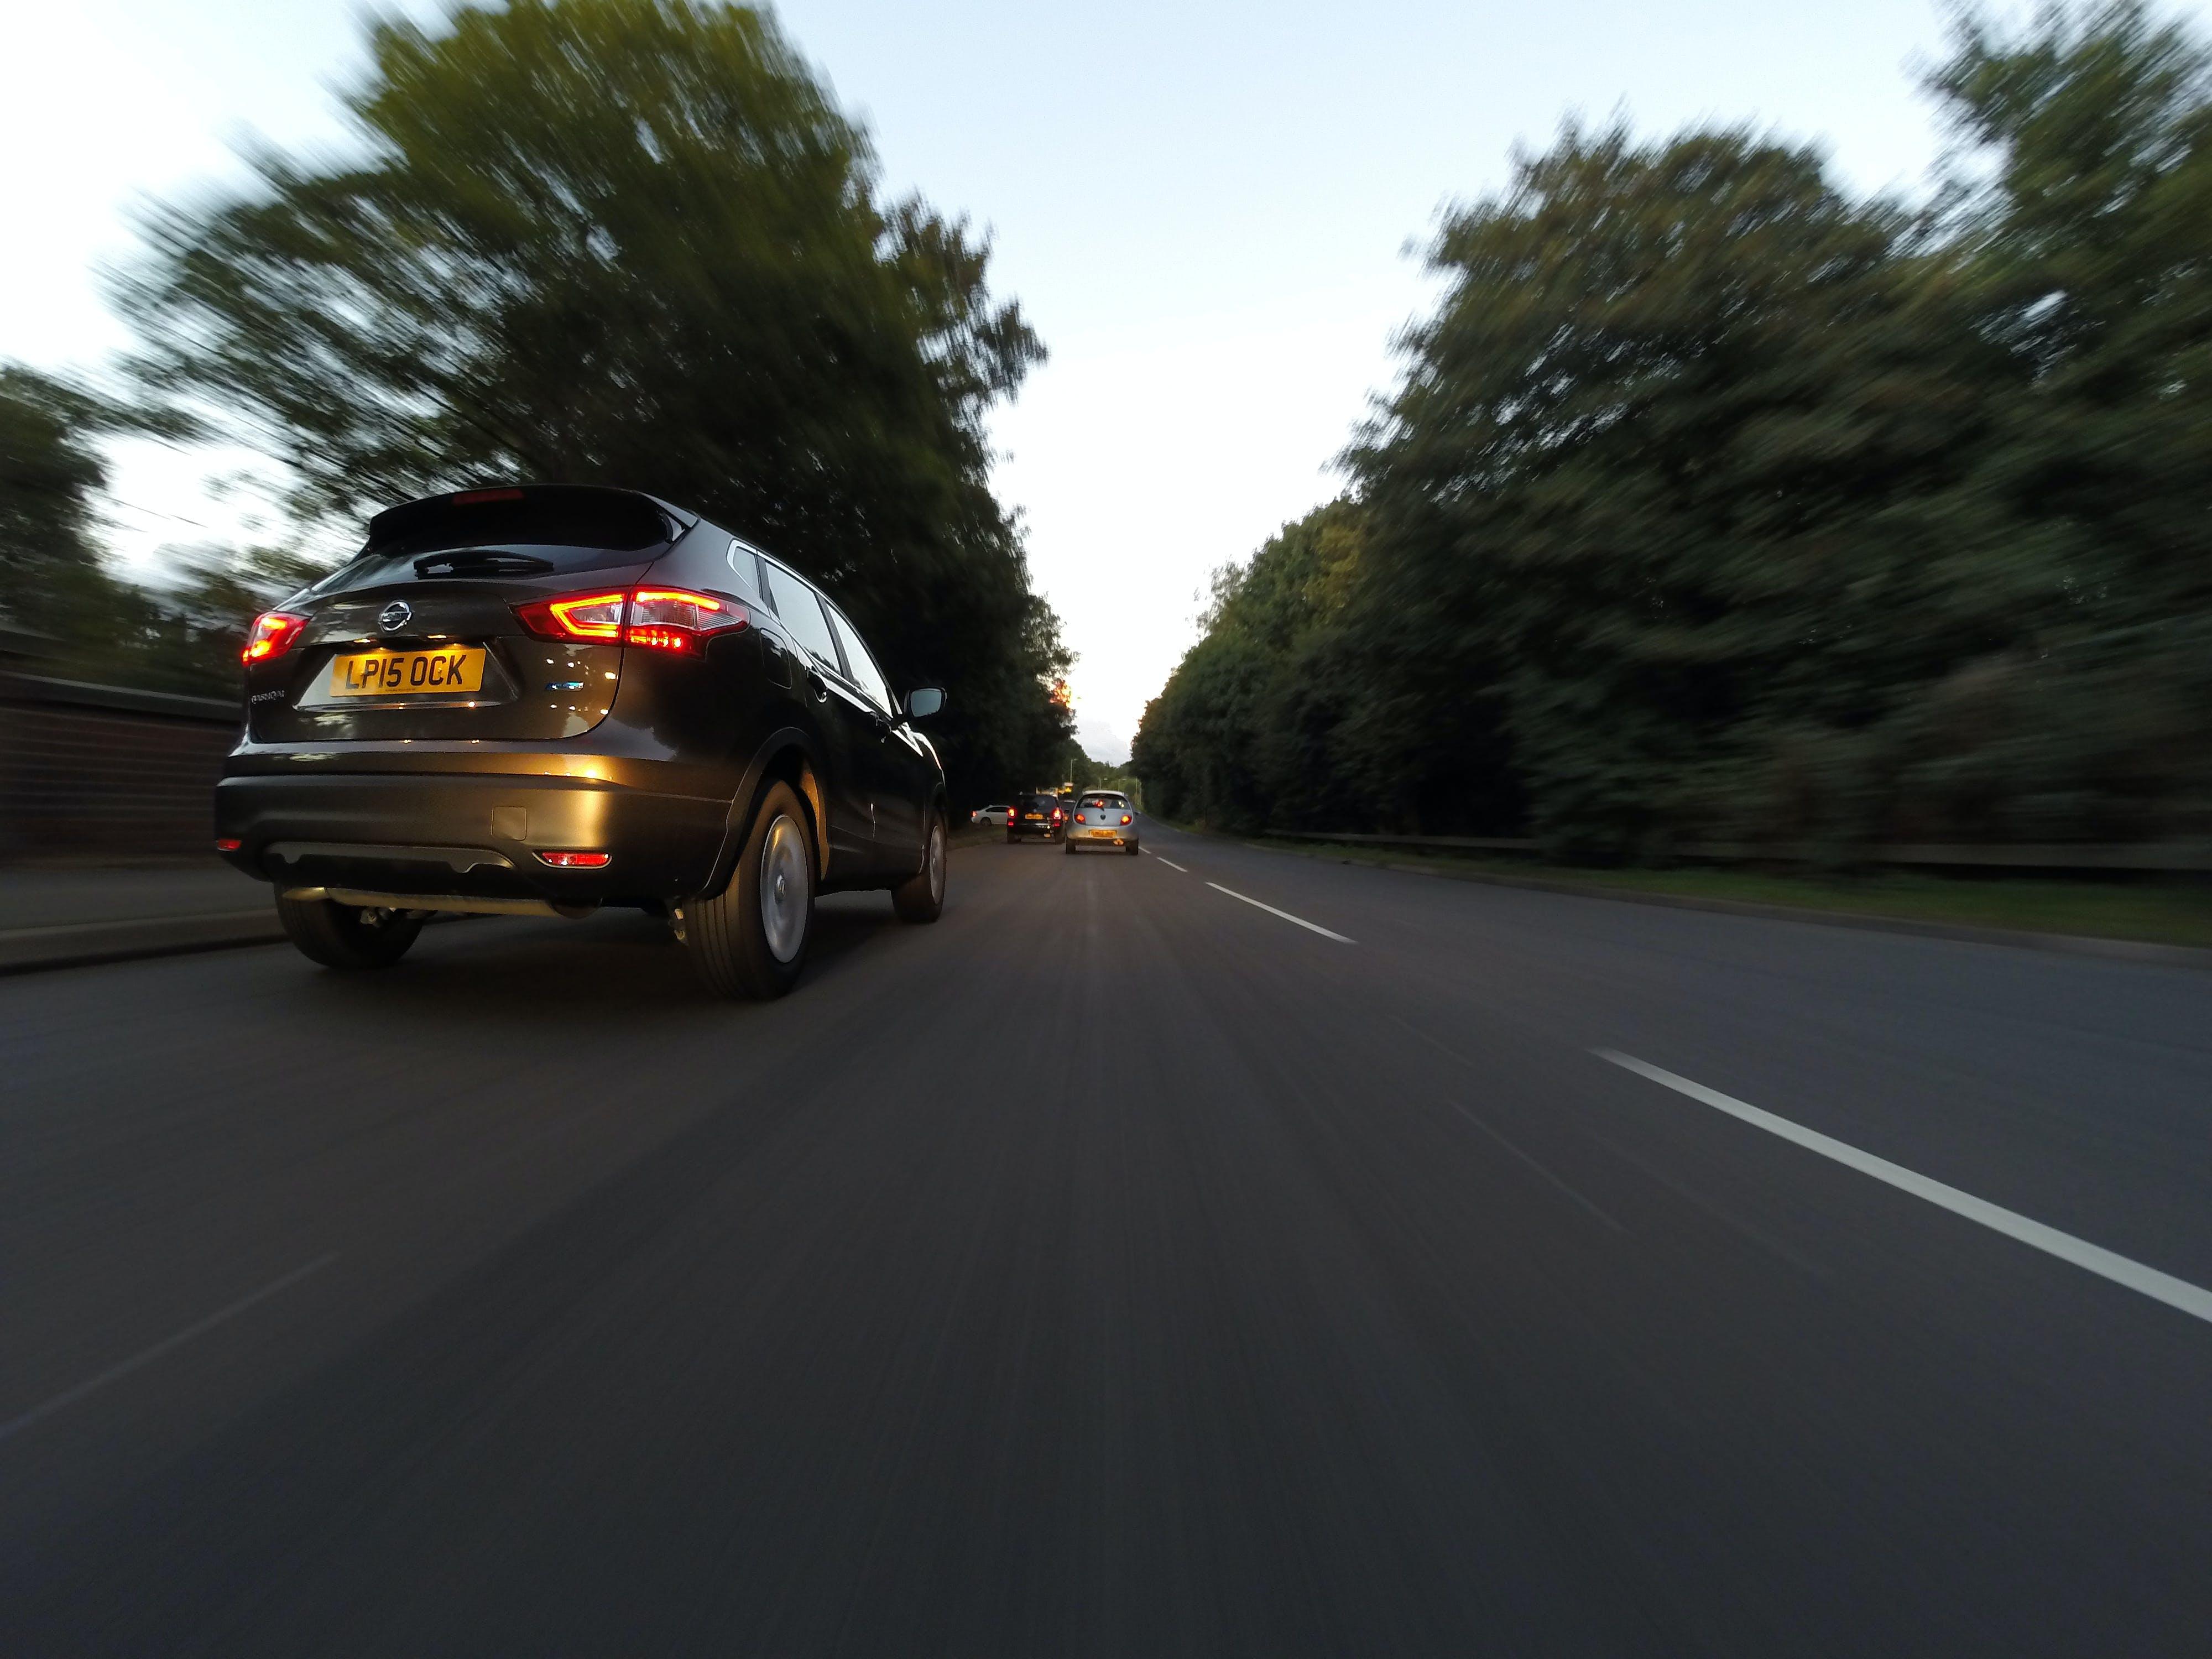 asphalt, automotive, cars